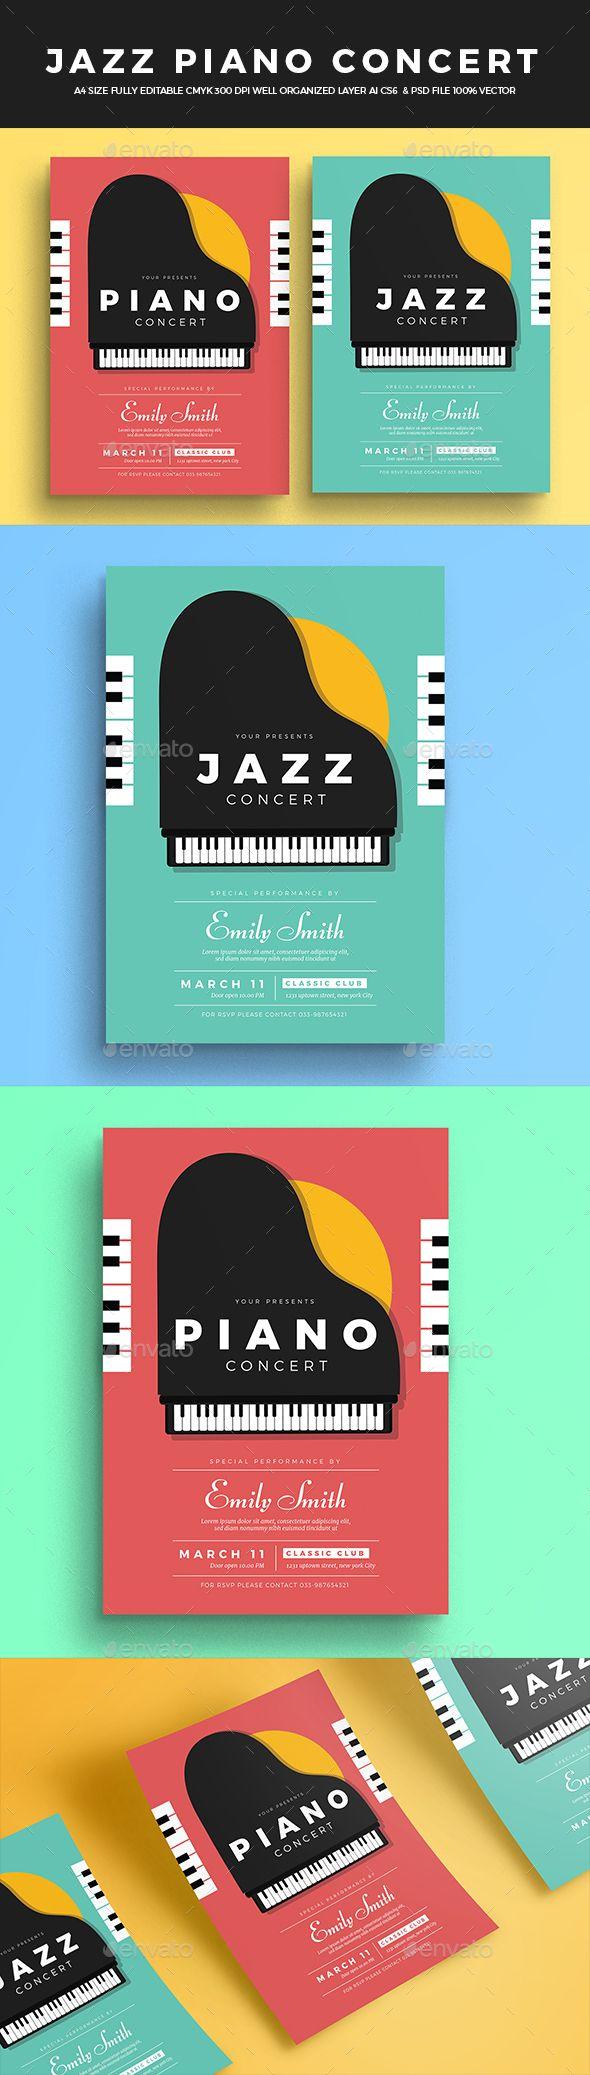 Jazz Piano Concert Flyer — Photoshop PSD #festival #simple • Download ➝ https://graphicriver.net/item/jazz-piano-concert-flyer/19561346?ref=pxcr